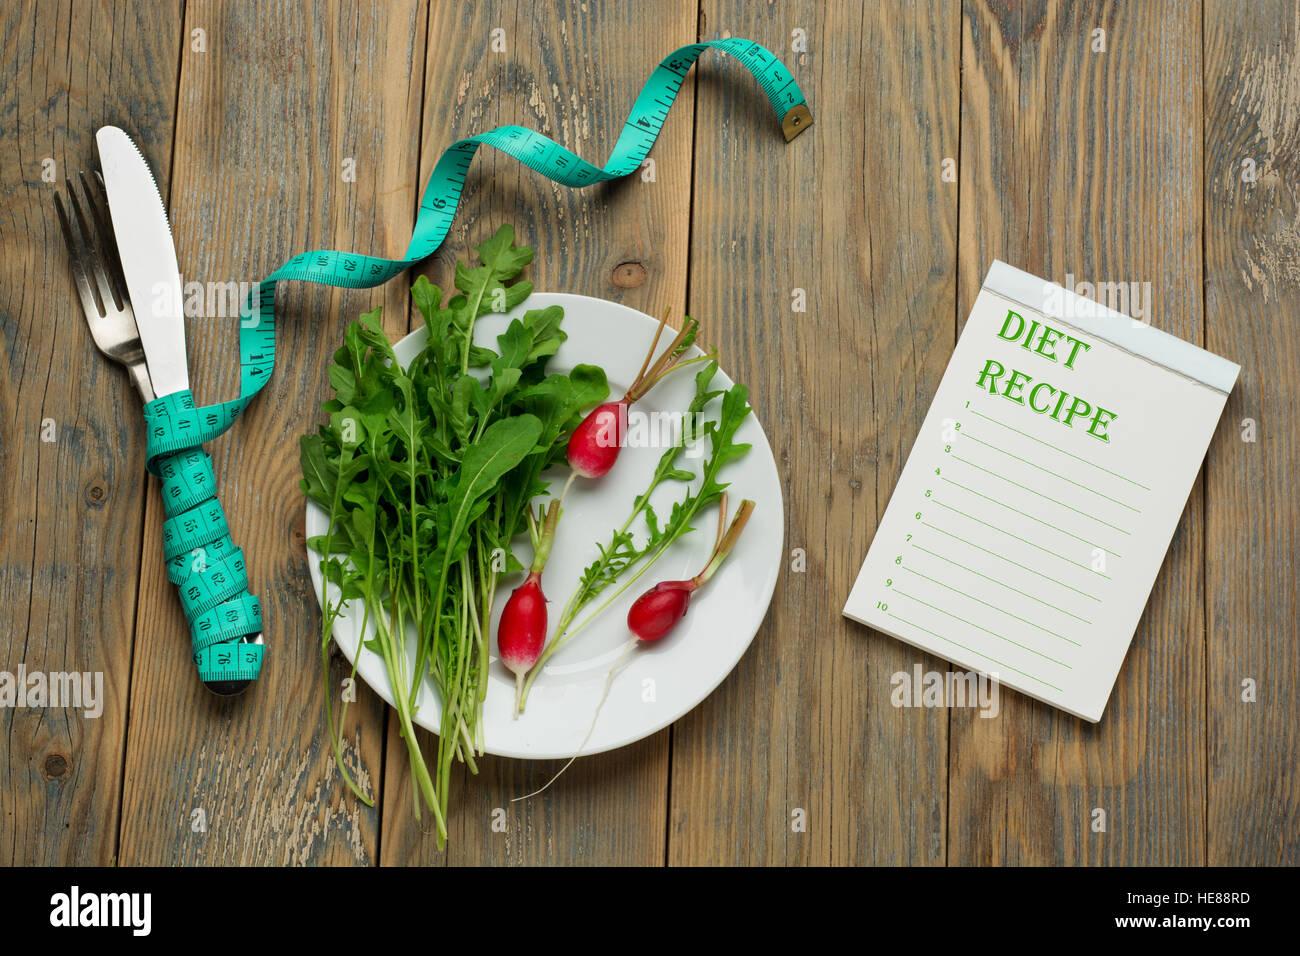 Plan de dieta, menú o programa, cinta métrica, alimento de la dieta en la placa blanca, pérdida de Imagen De Stock